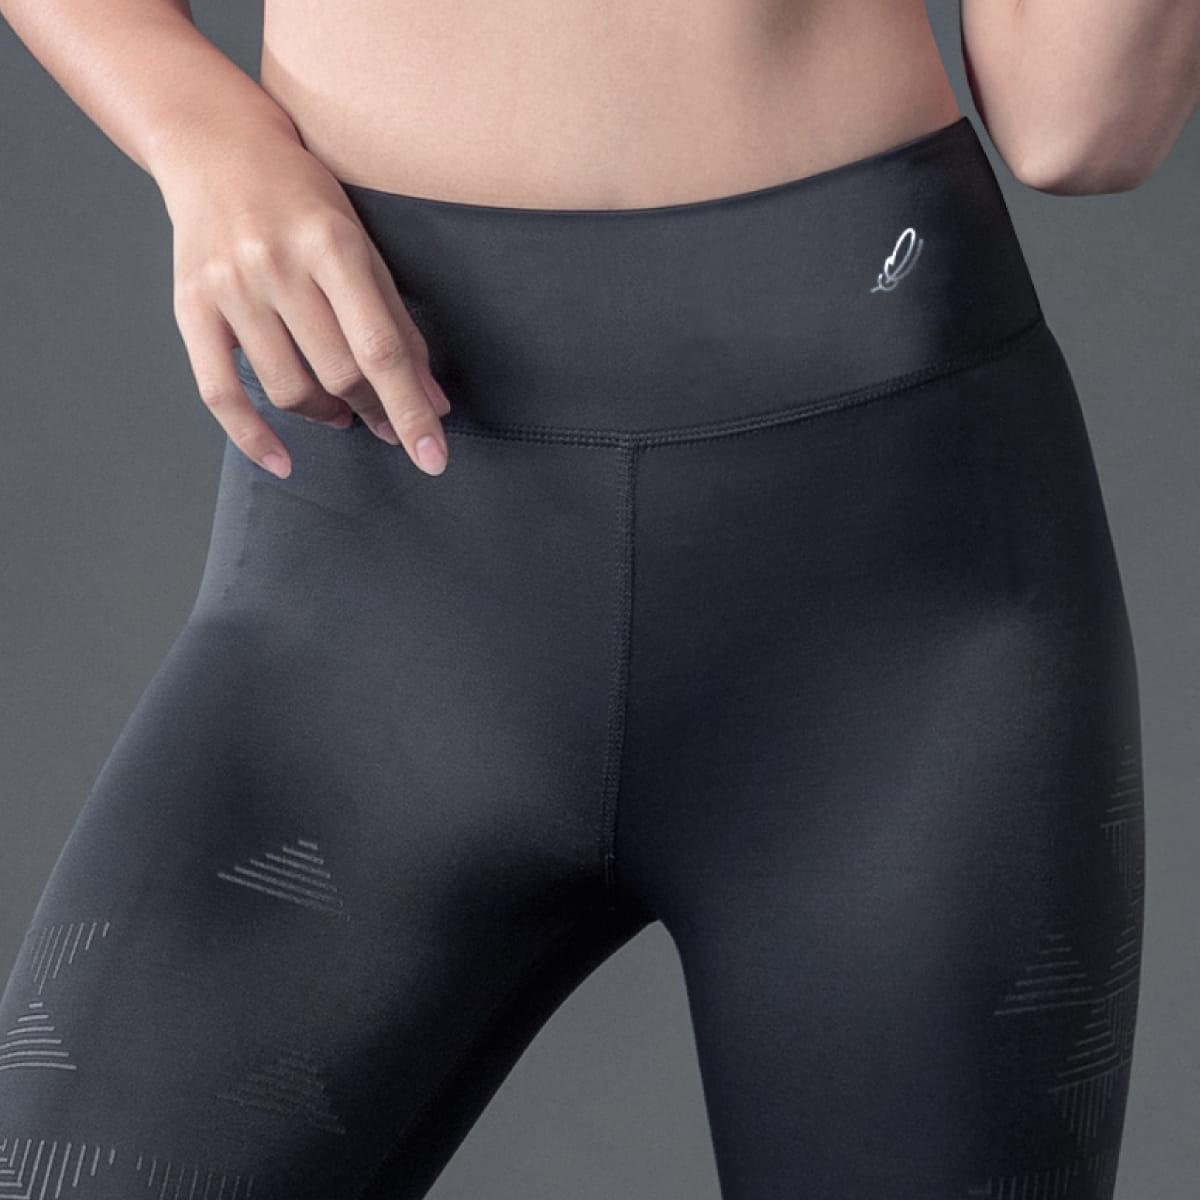 TENO超彈感美型健身褲-Mountain山稜 16